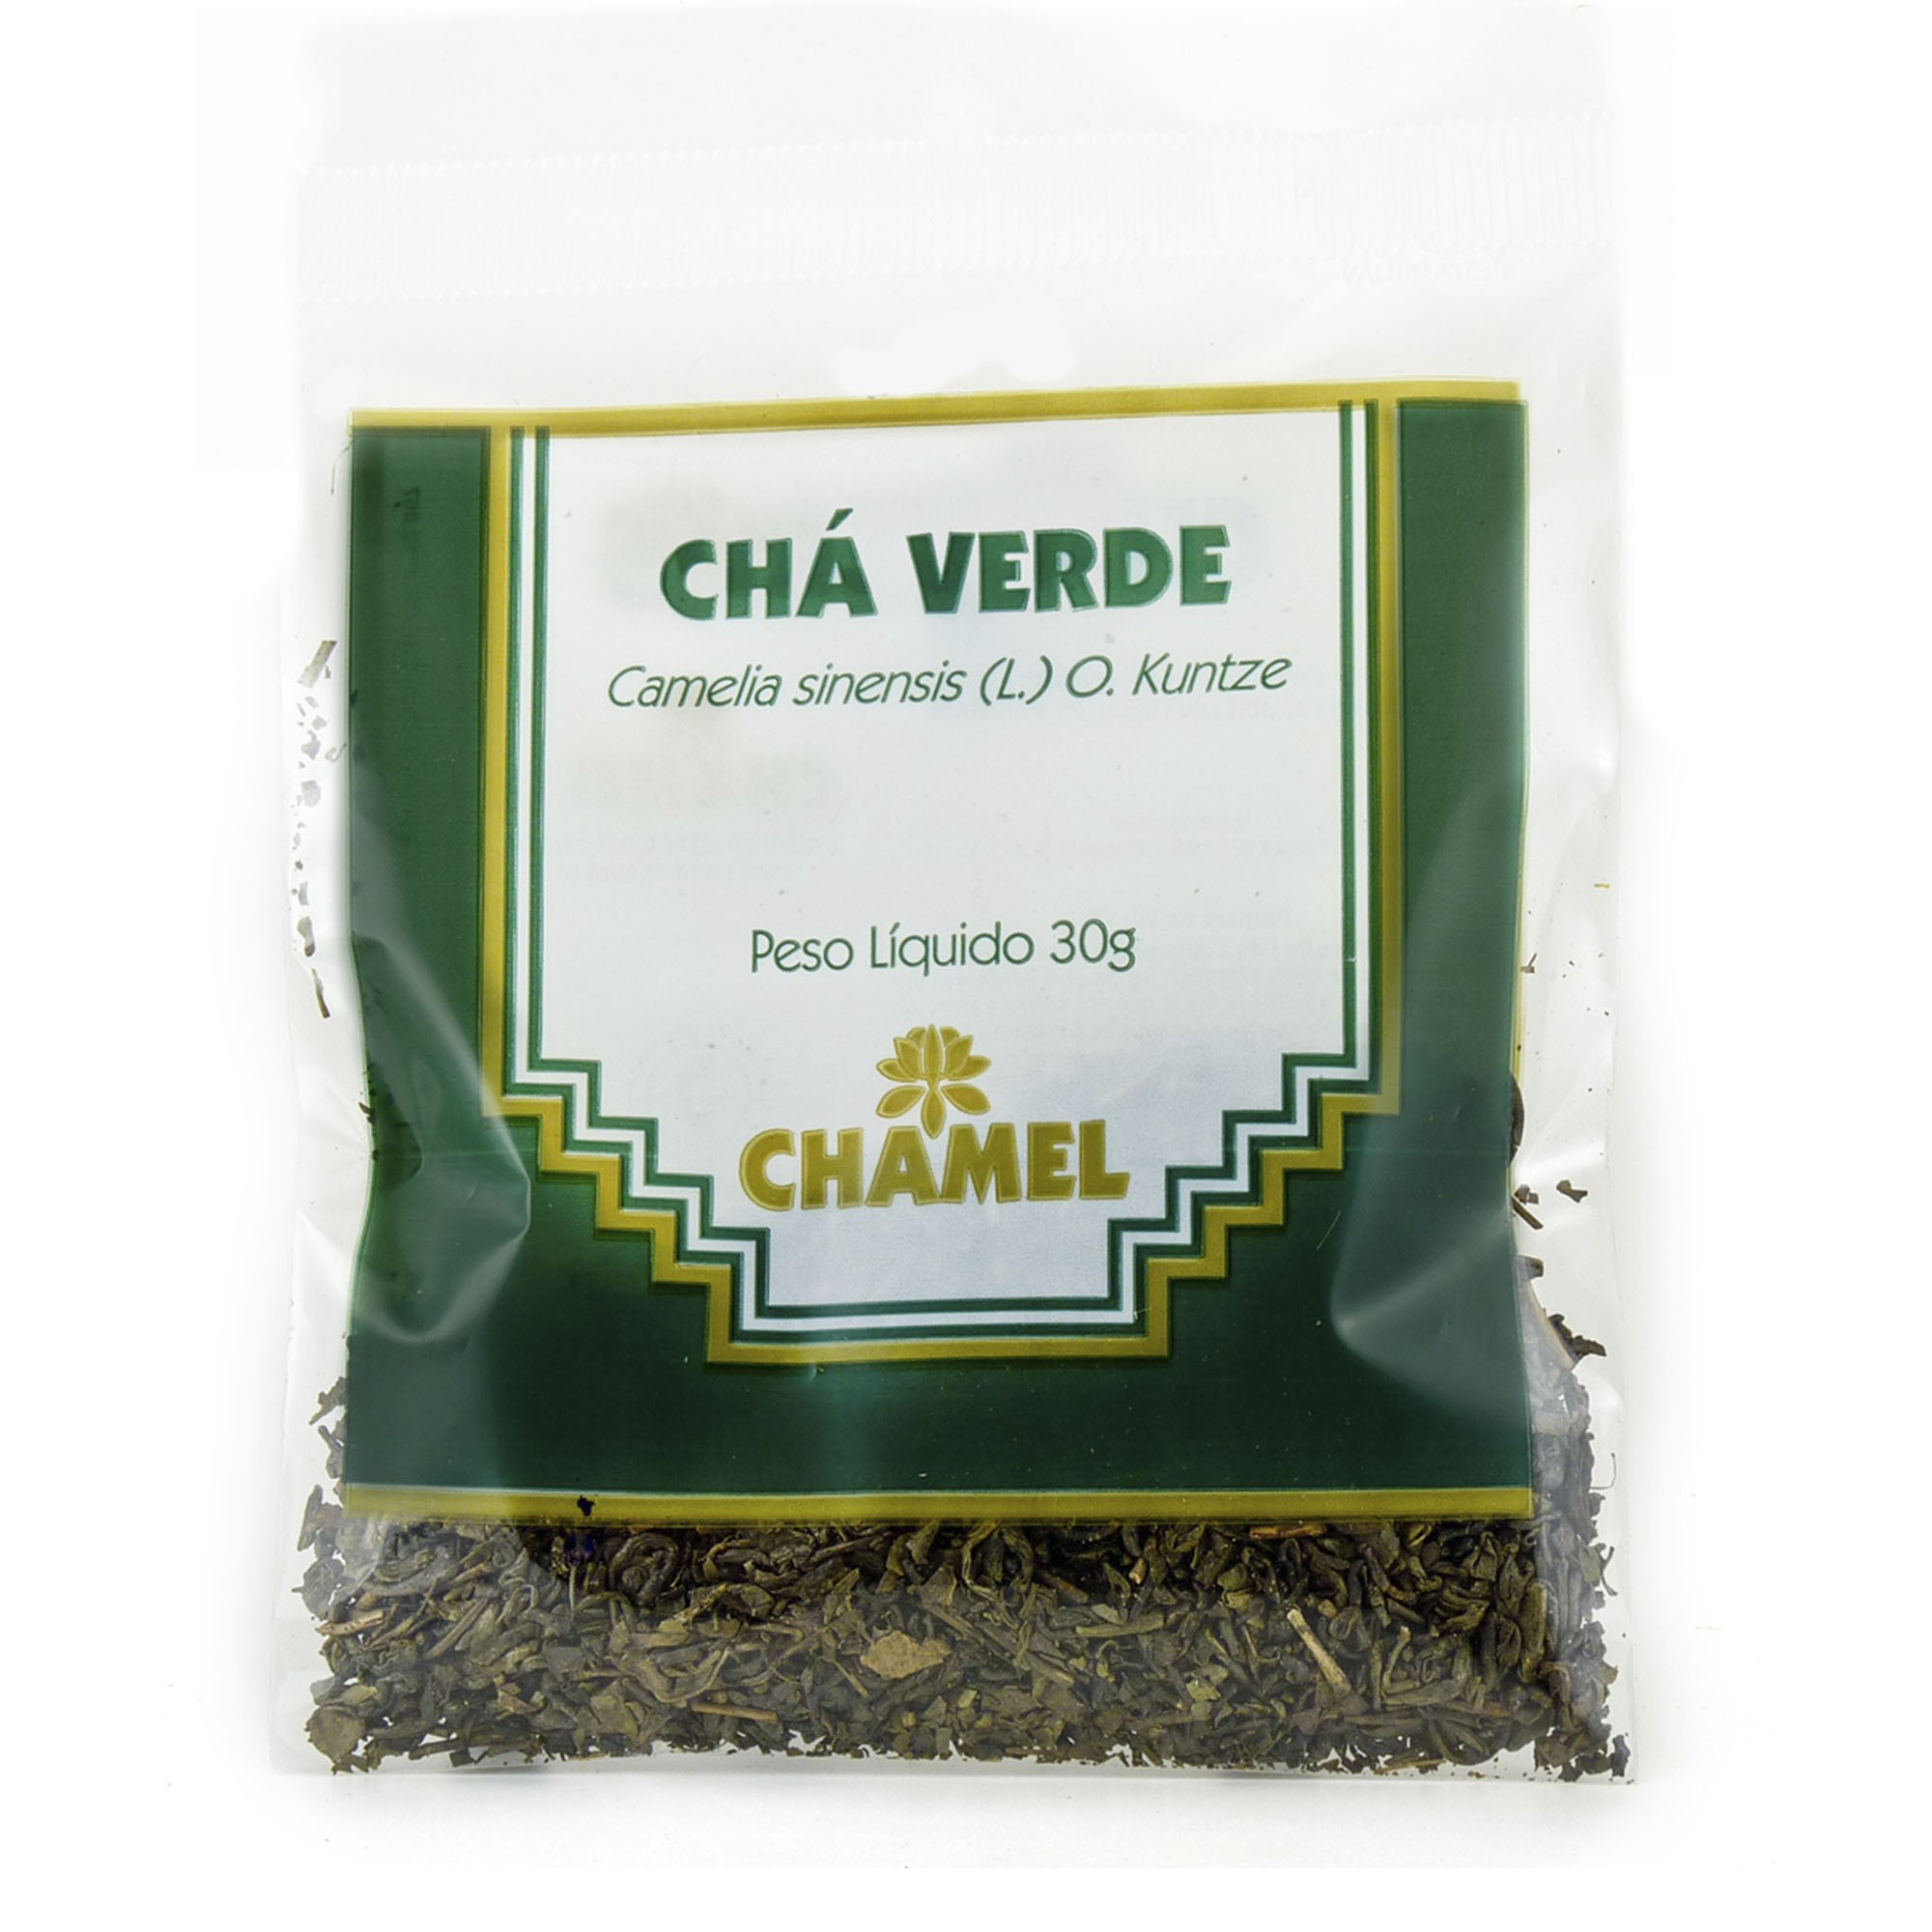 Chá Verde 30g Chamel - Chá-Folhas